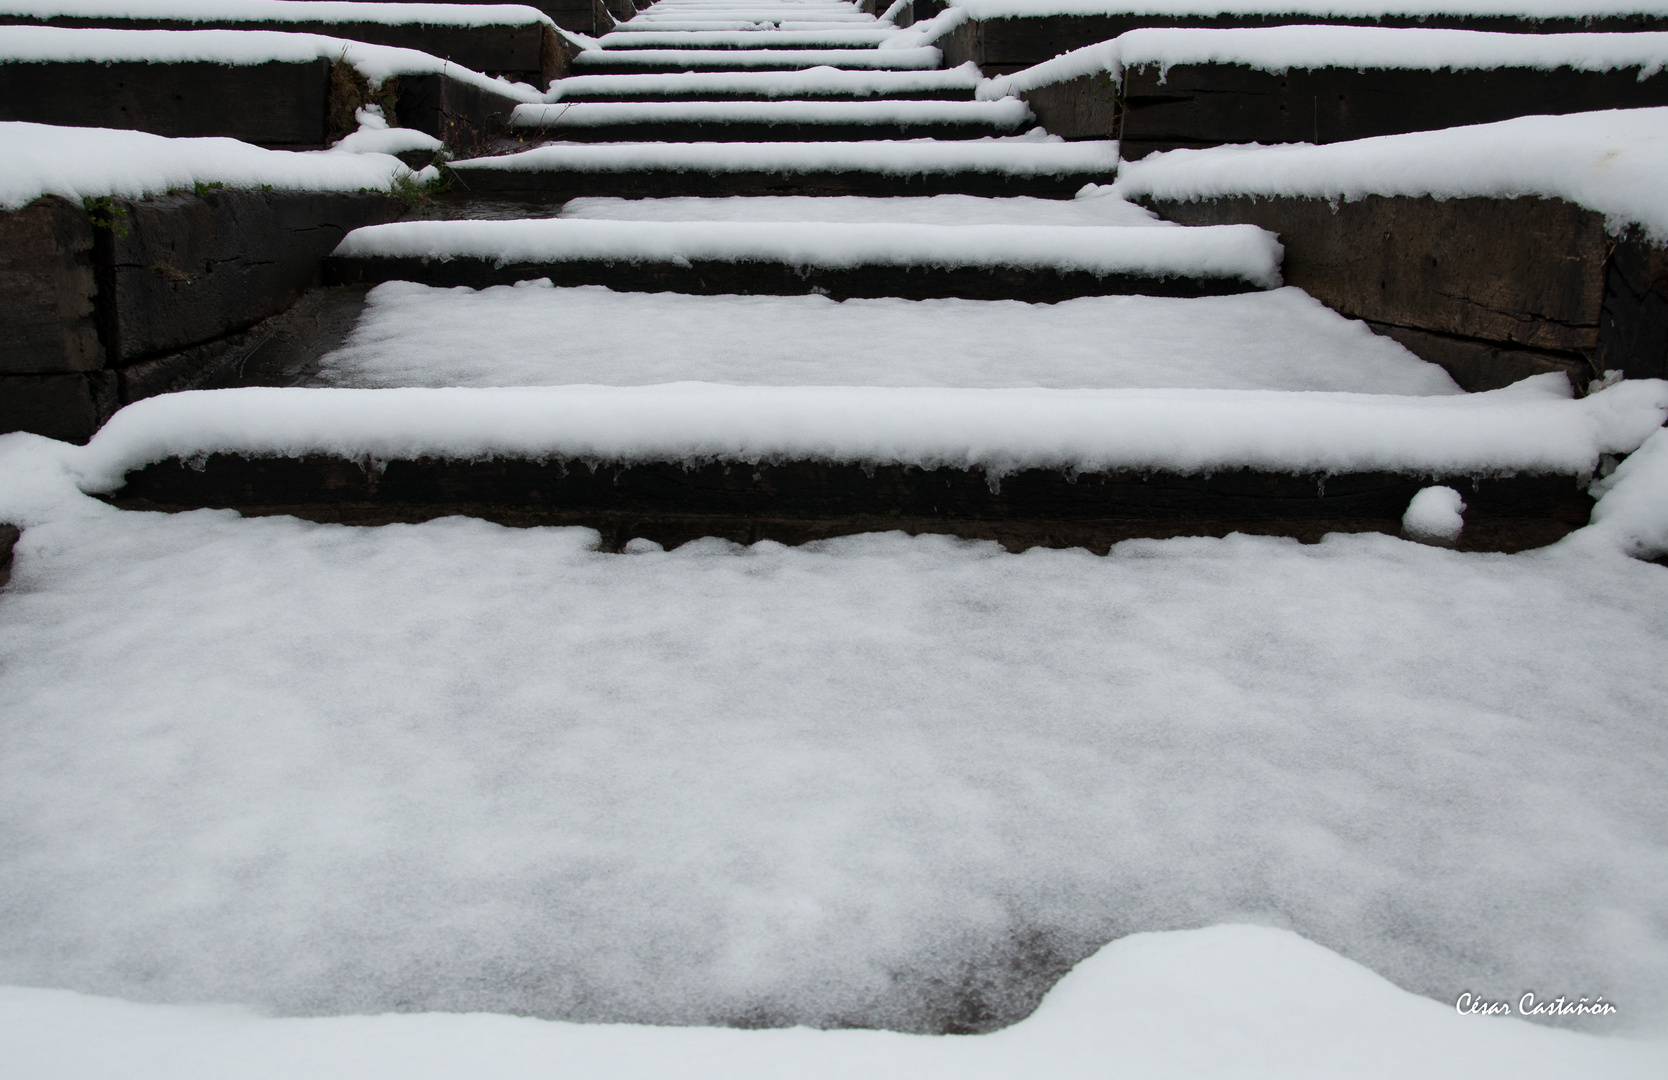 Nieve y madera